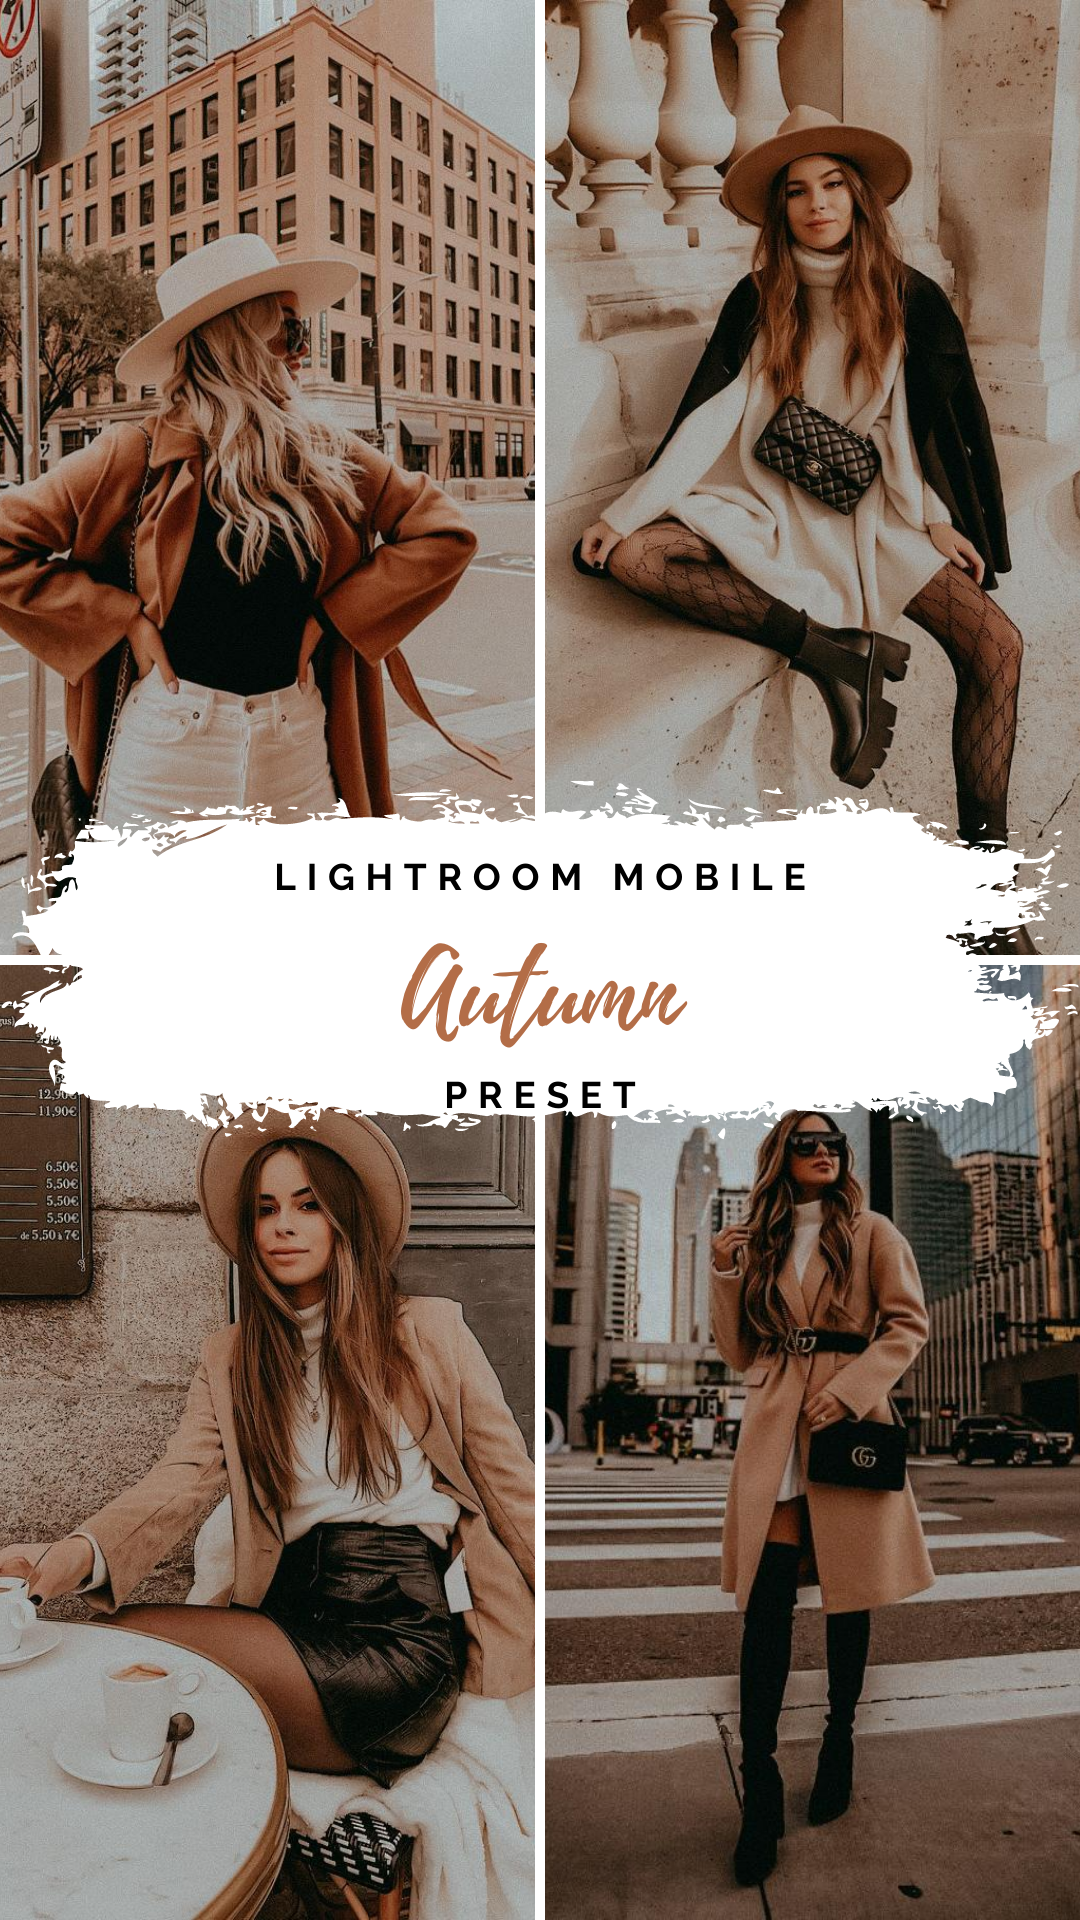 Lifestyle Lightroom Presets Mobile And Desktop For Bloggers Autumn Presets Instagram Filters Presets Colorful Mobile Dng Fall Presets In 2020 Lightroom Presets Lightroom Lightroom Presets Free